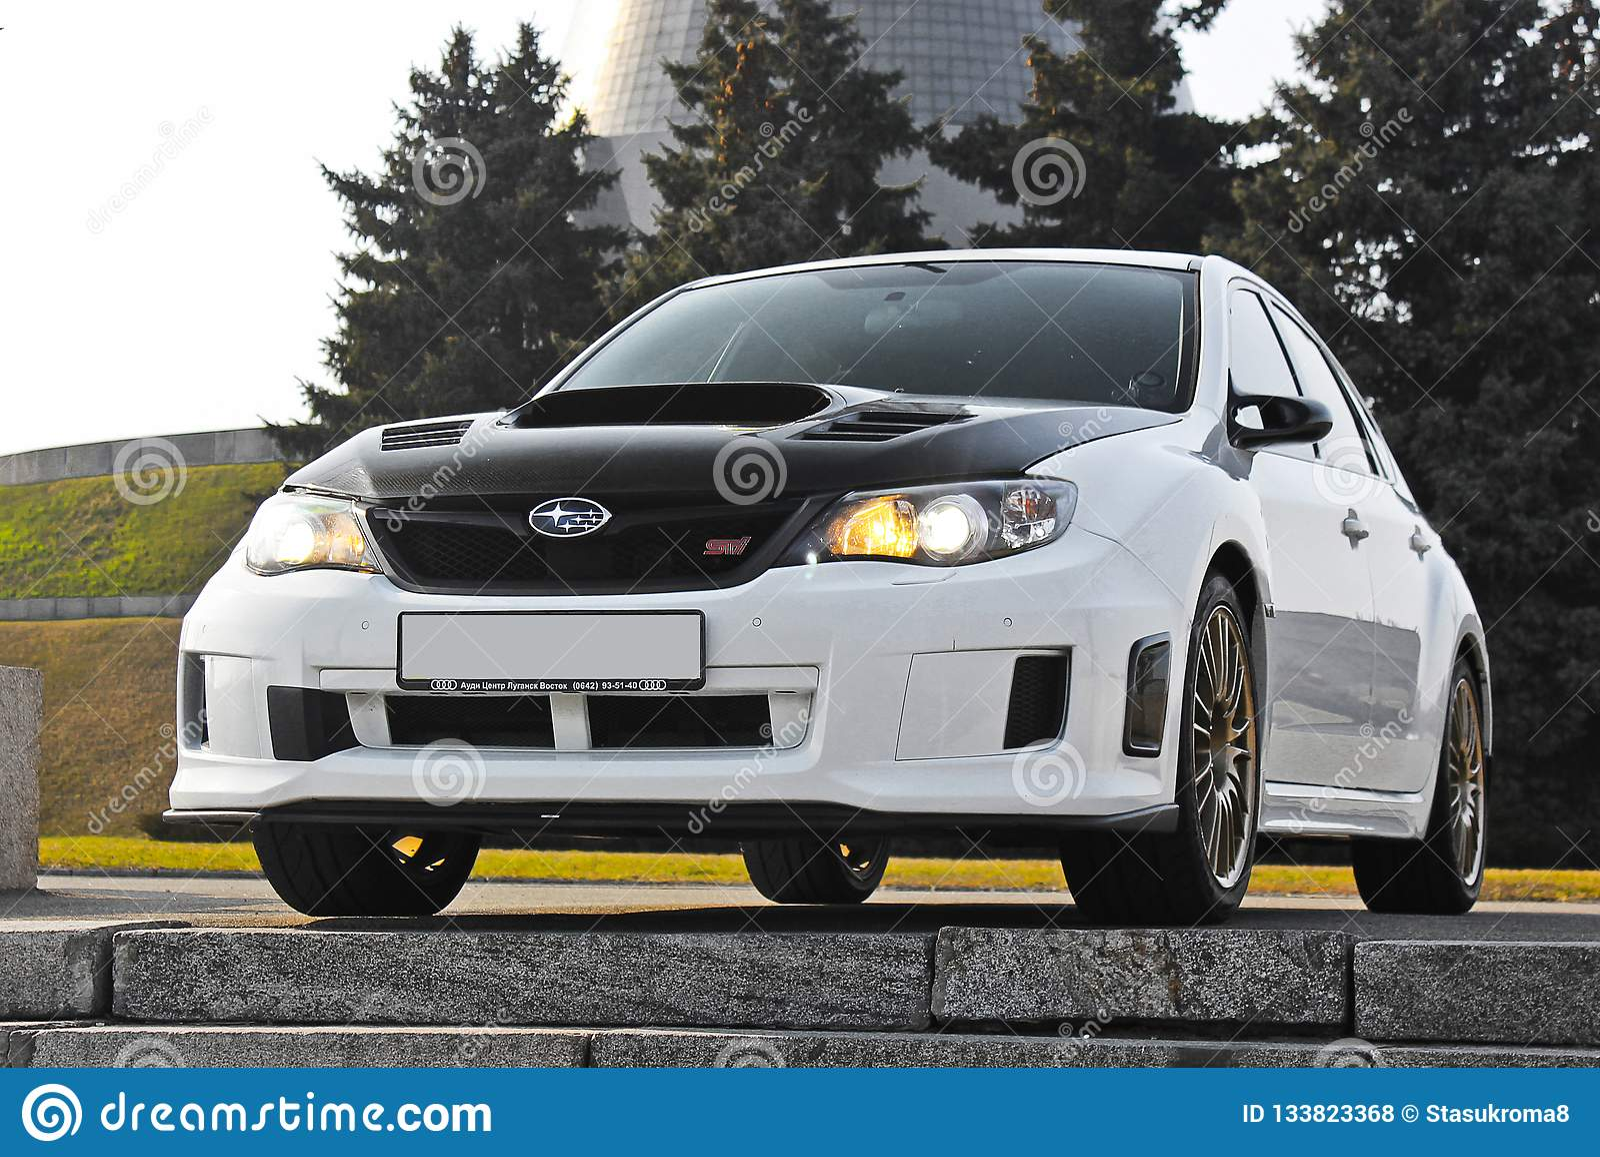 Kiev, Ukraine; January 20, 2014. Subaru Impreza WRX STI